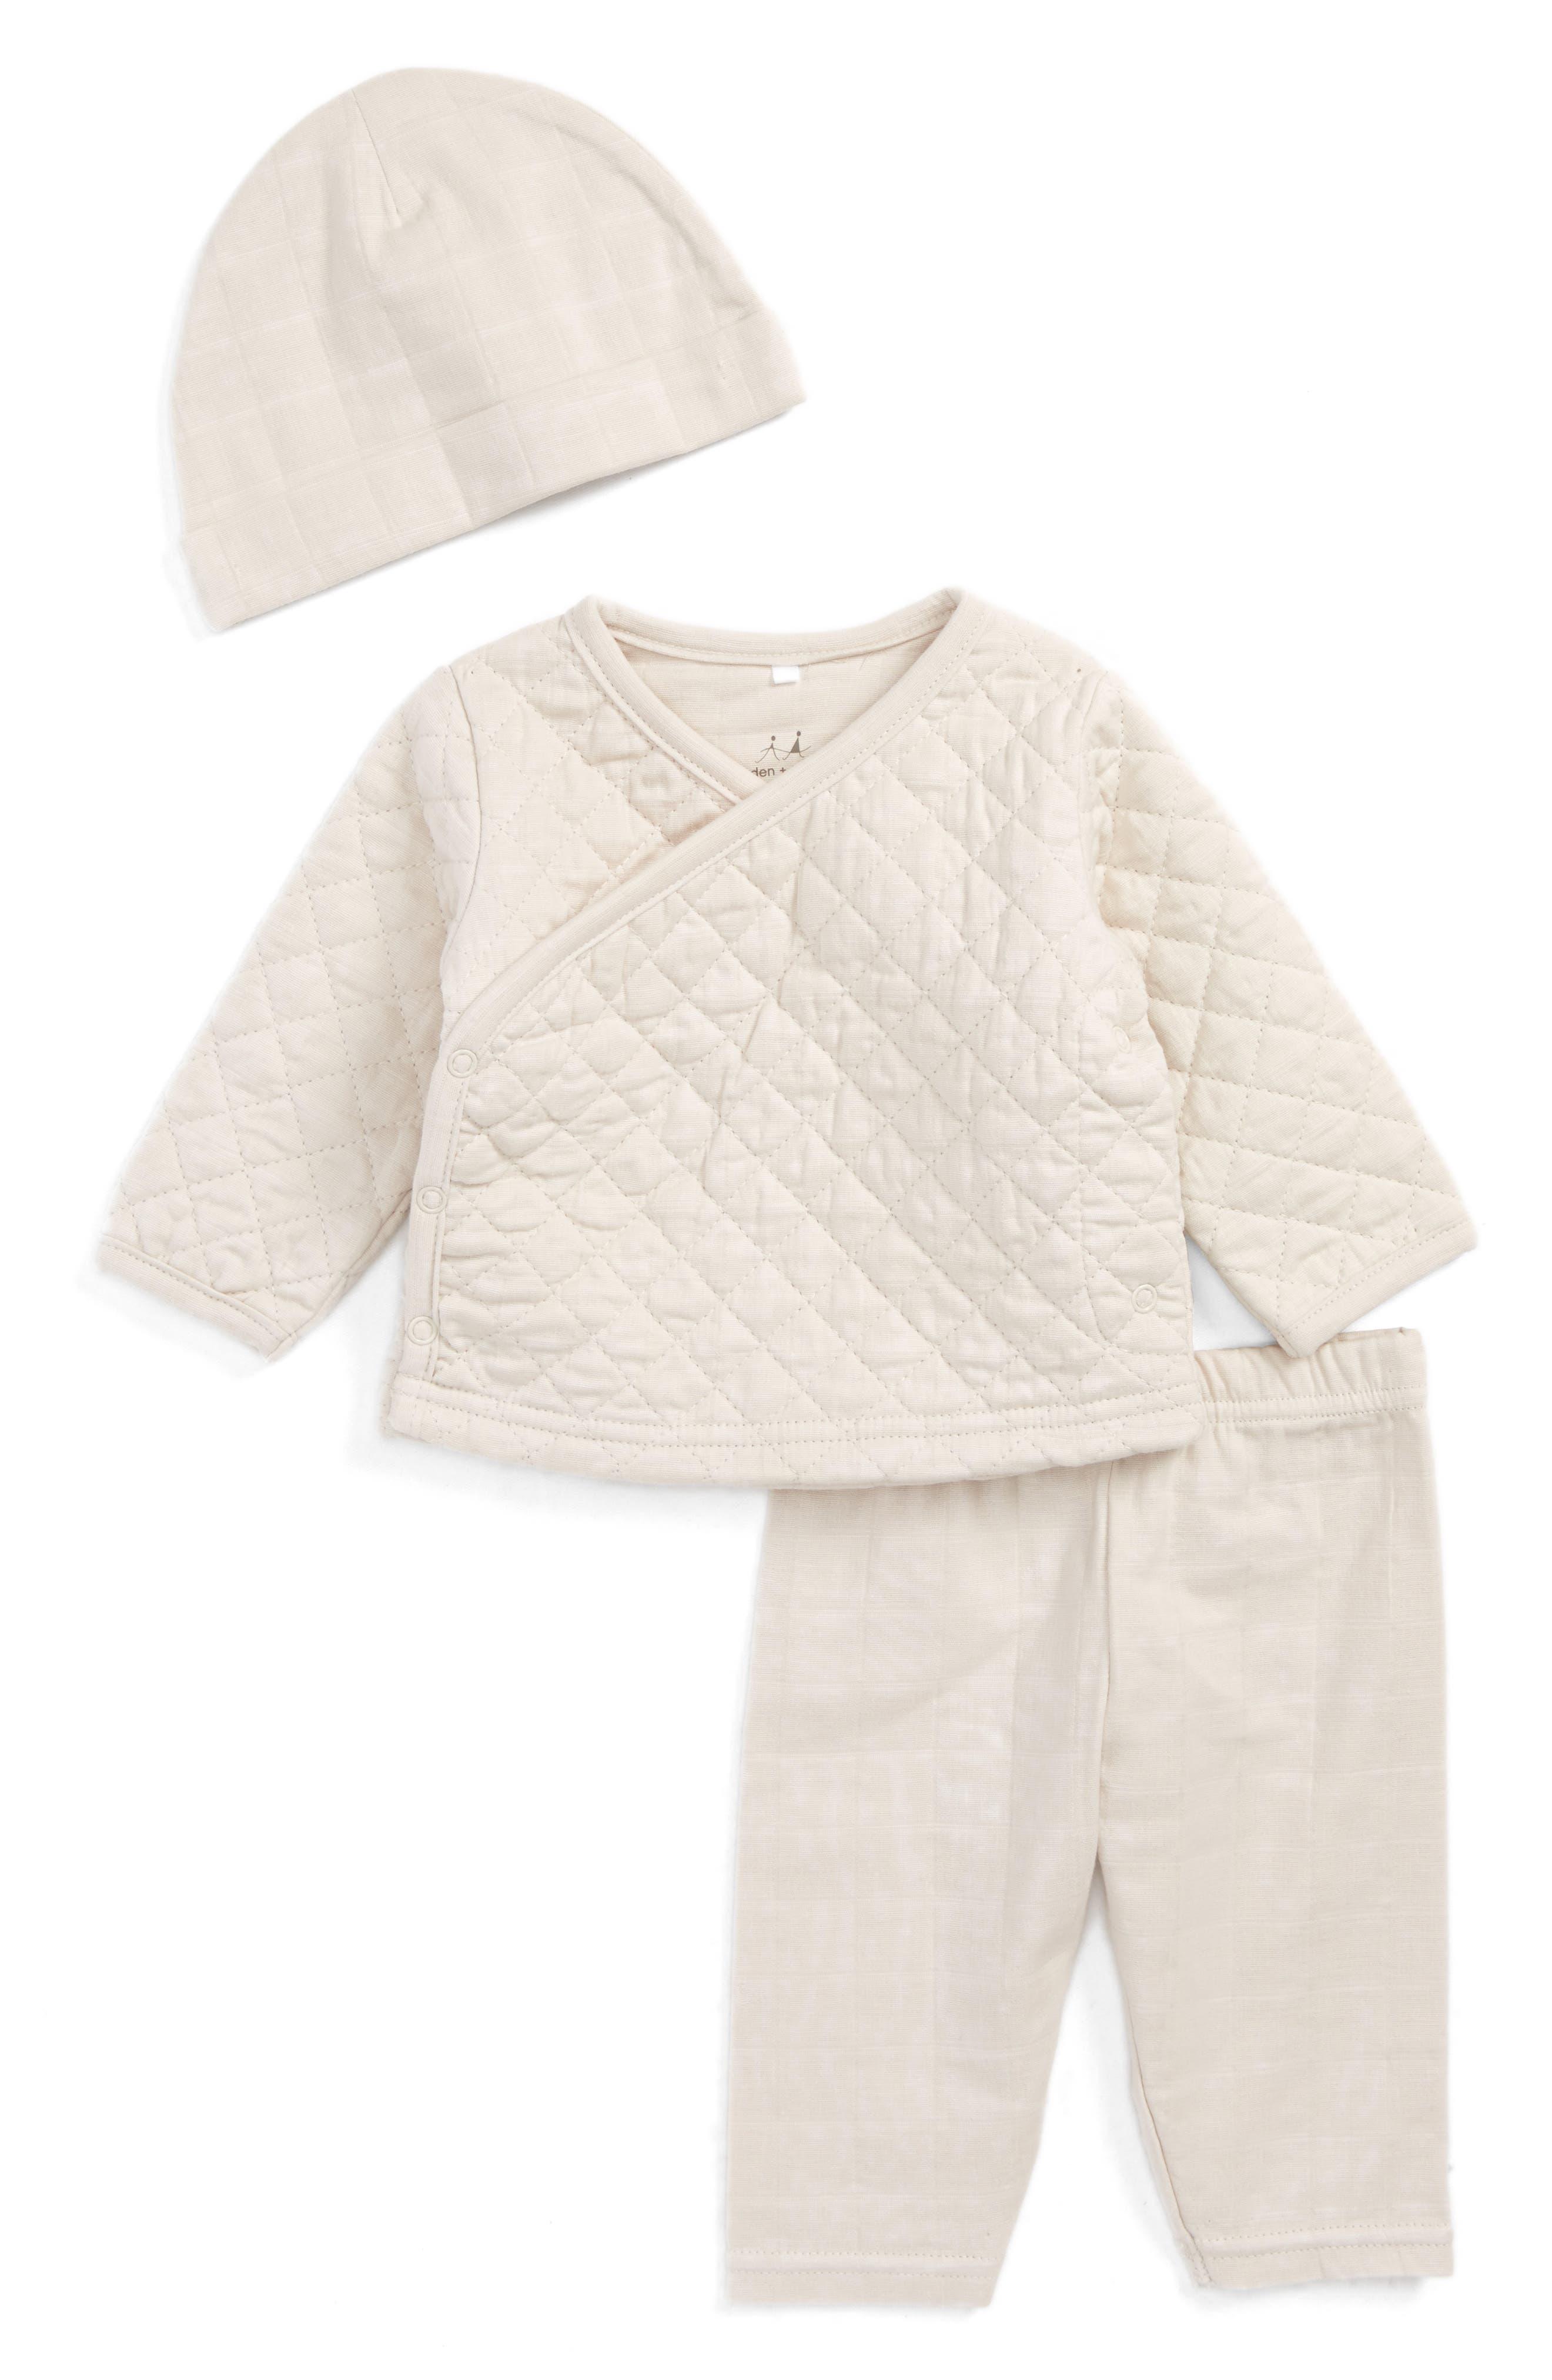 Main Image - aden + anais Top, Pants & Hat Set (Baby)